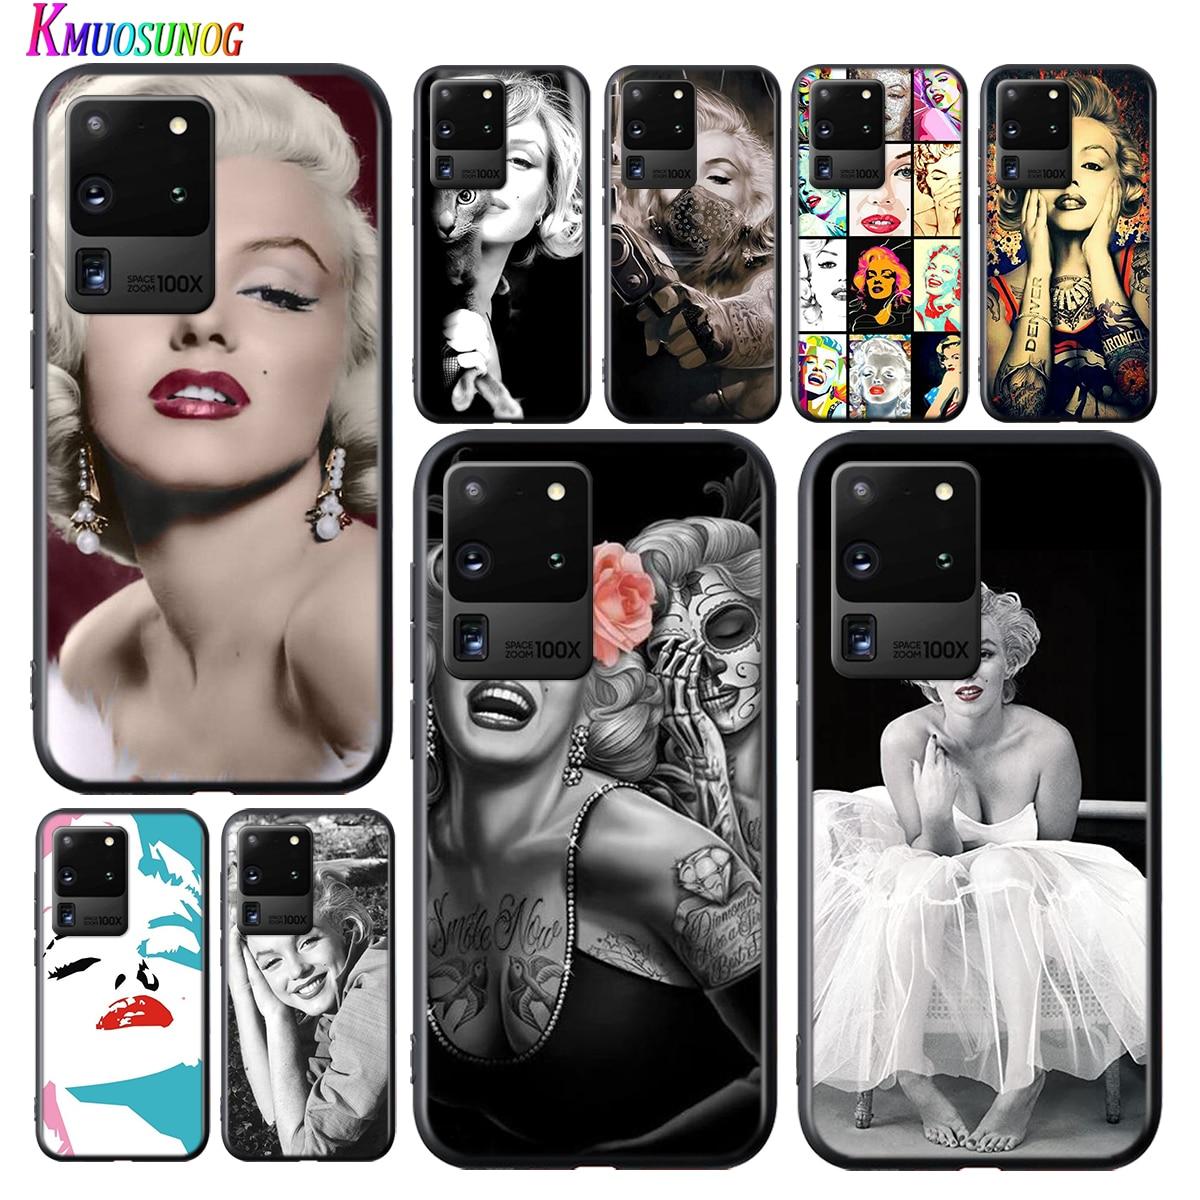 Hermosa Marilyn Monroe para Samsung Galaxy S20Ultra S20 Plus Nota 10 Lite A01 A11 A21 A21S A31 A41 A51 A71 A91 2020 caja del teléfono